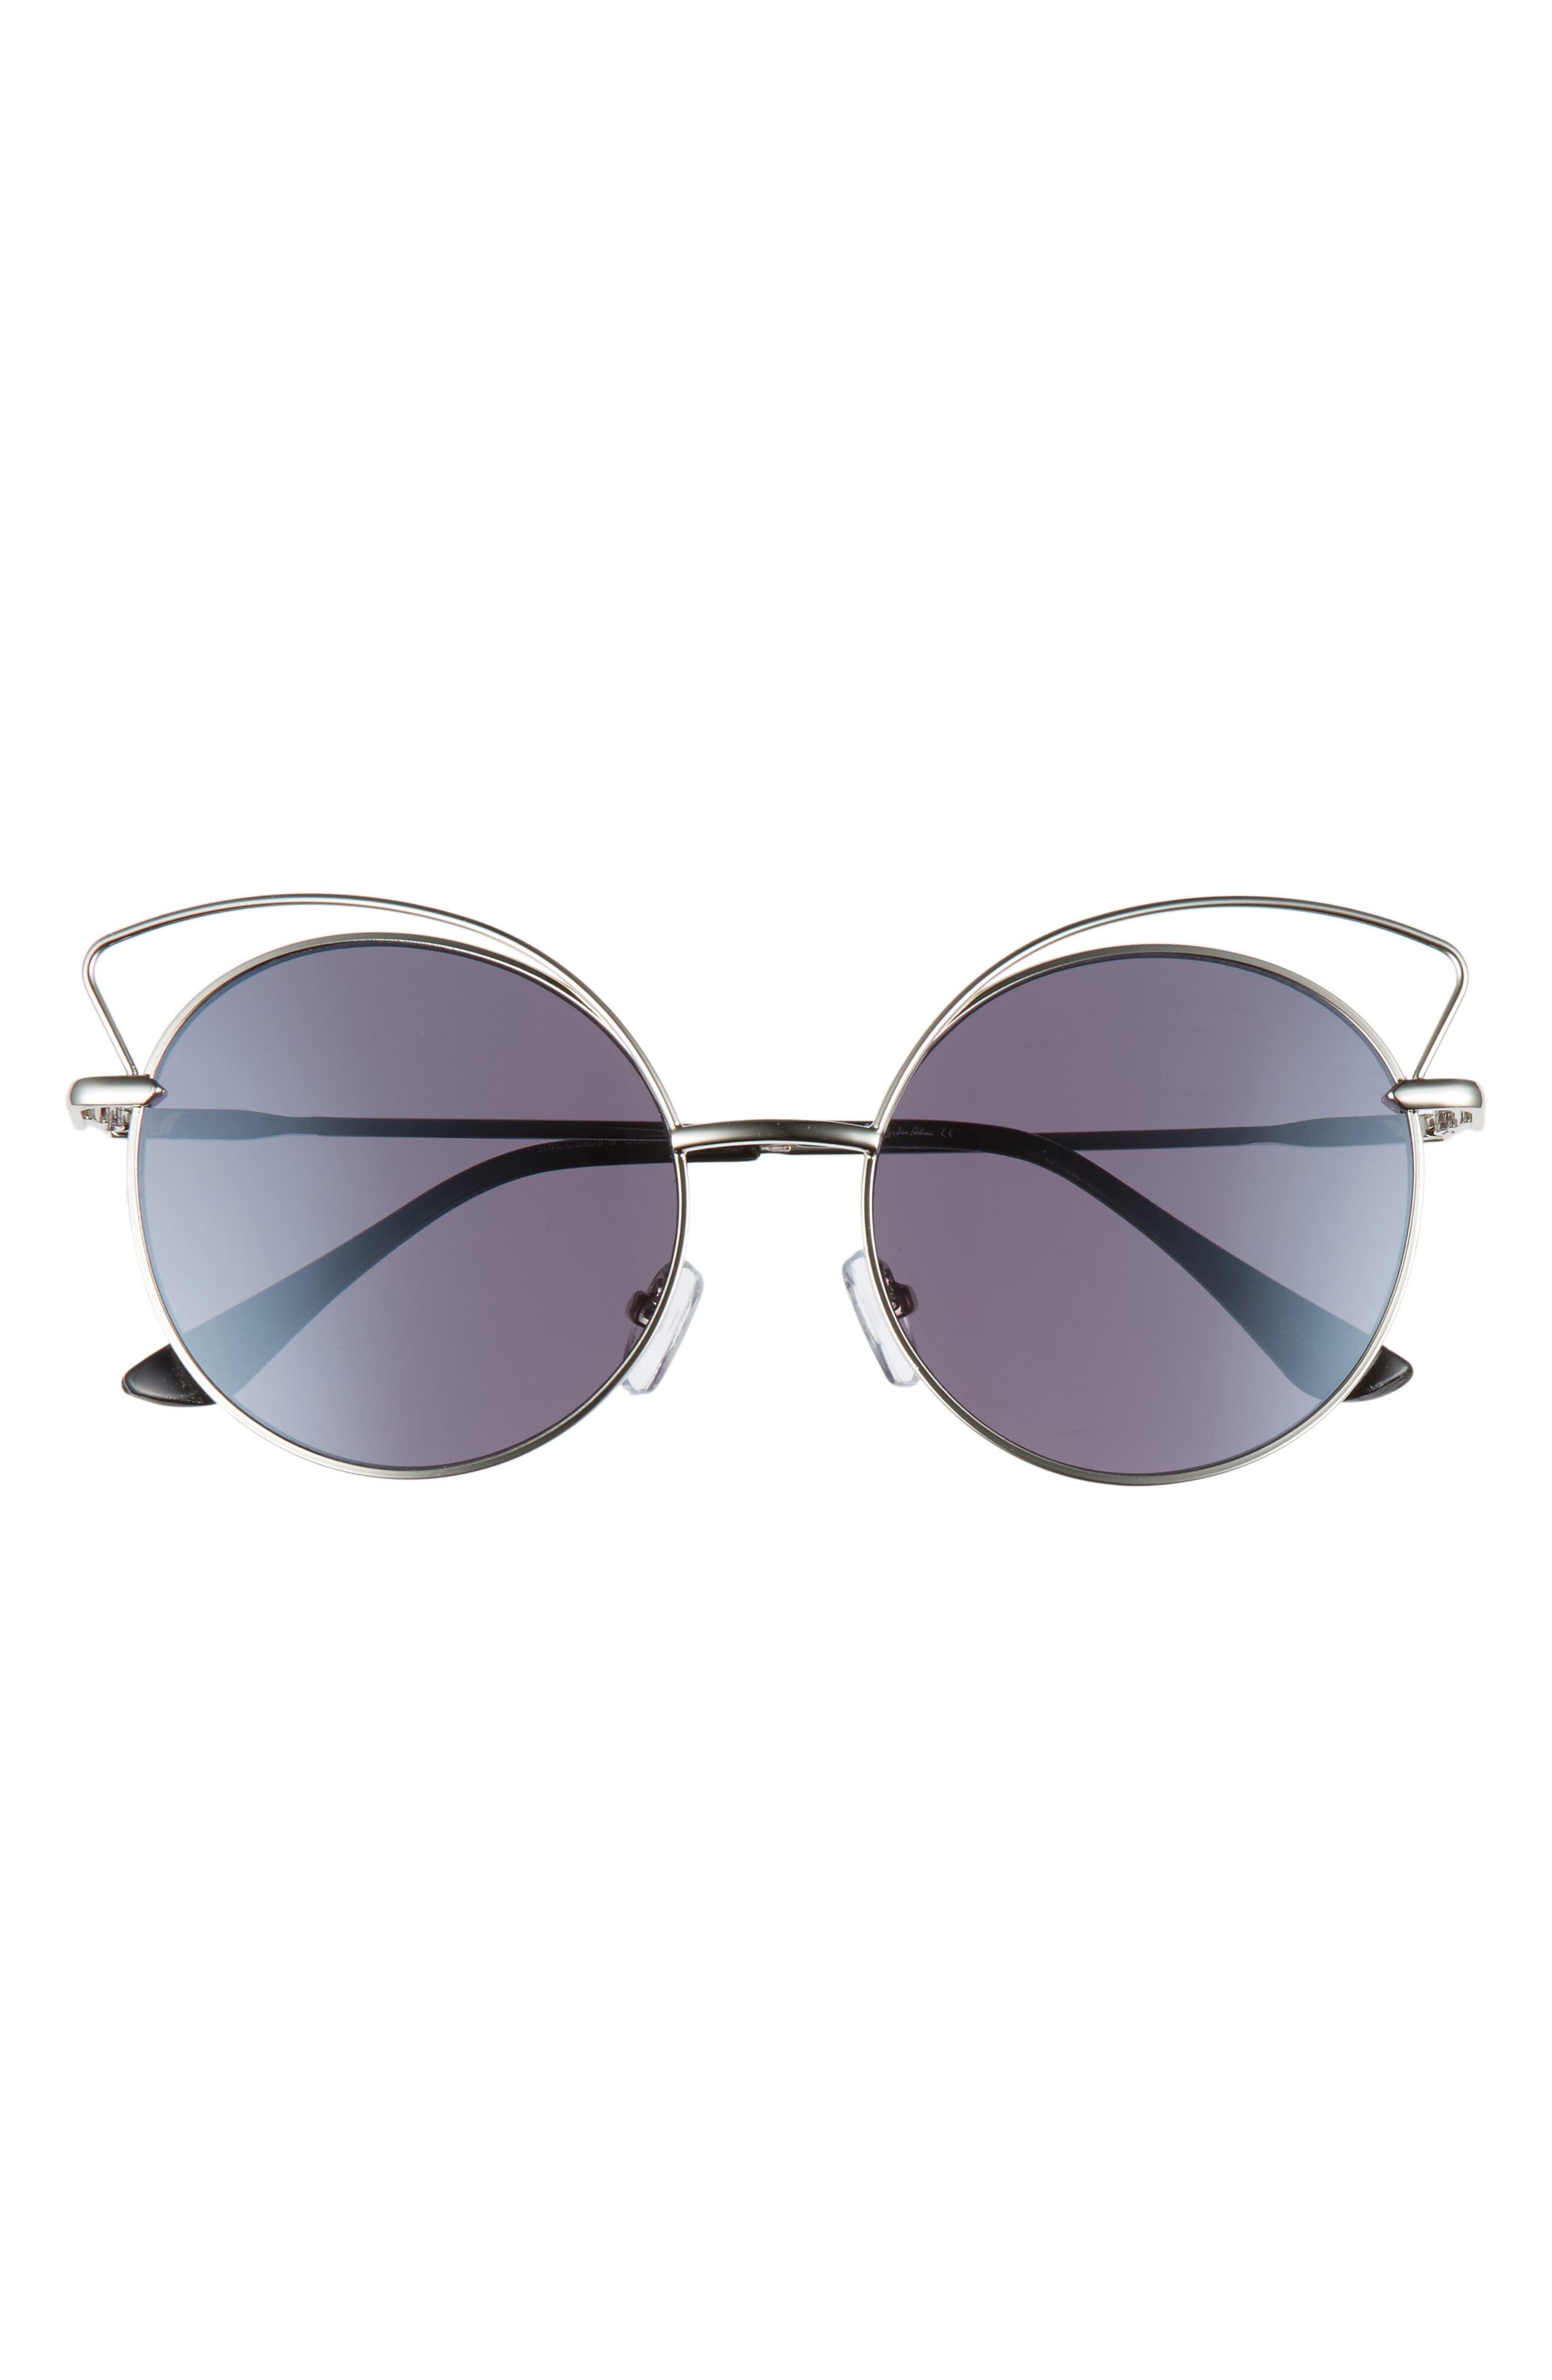 Satellite 55mm Round Sunglasses,                             Alternate thumbnail 3, color,                             040